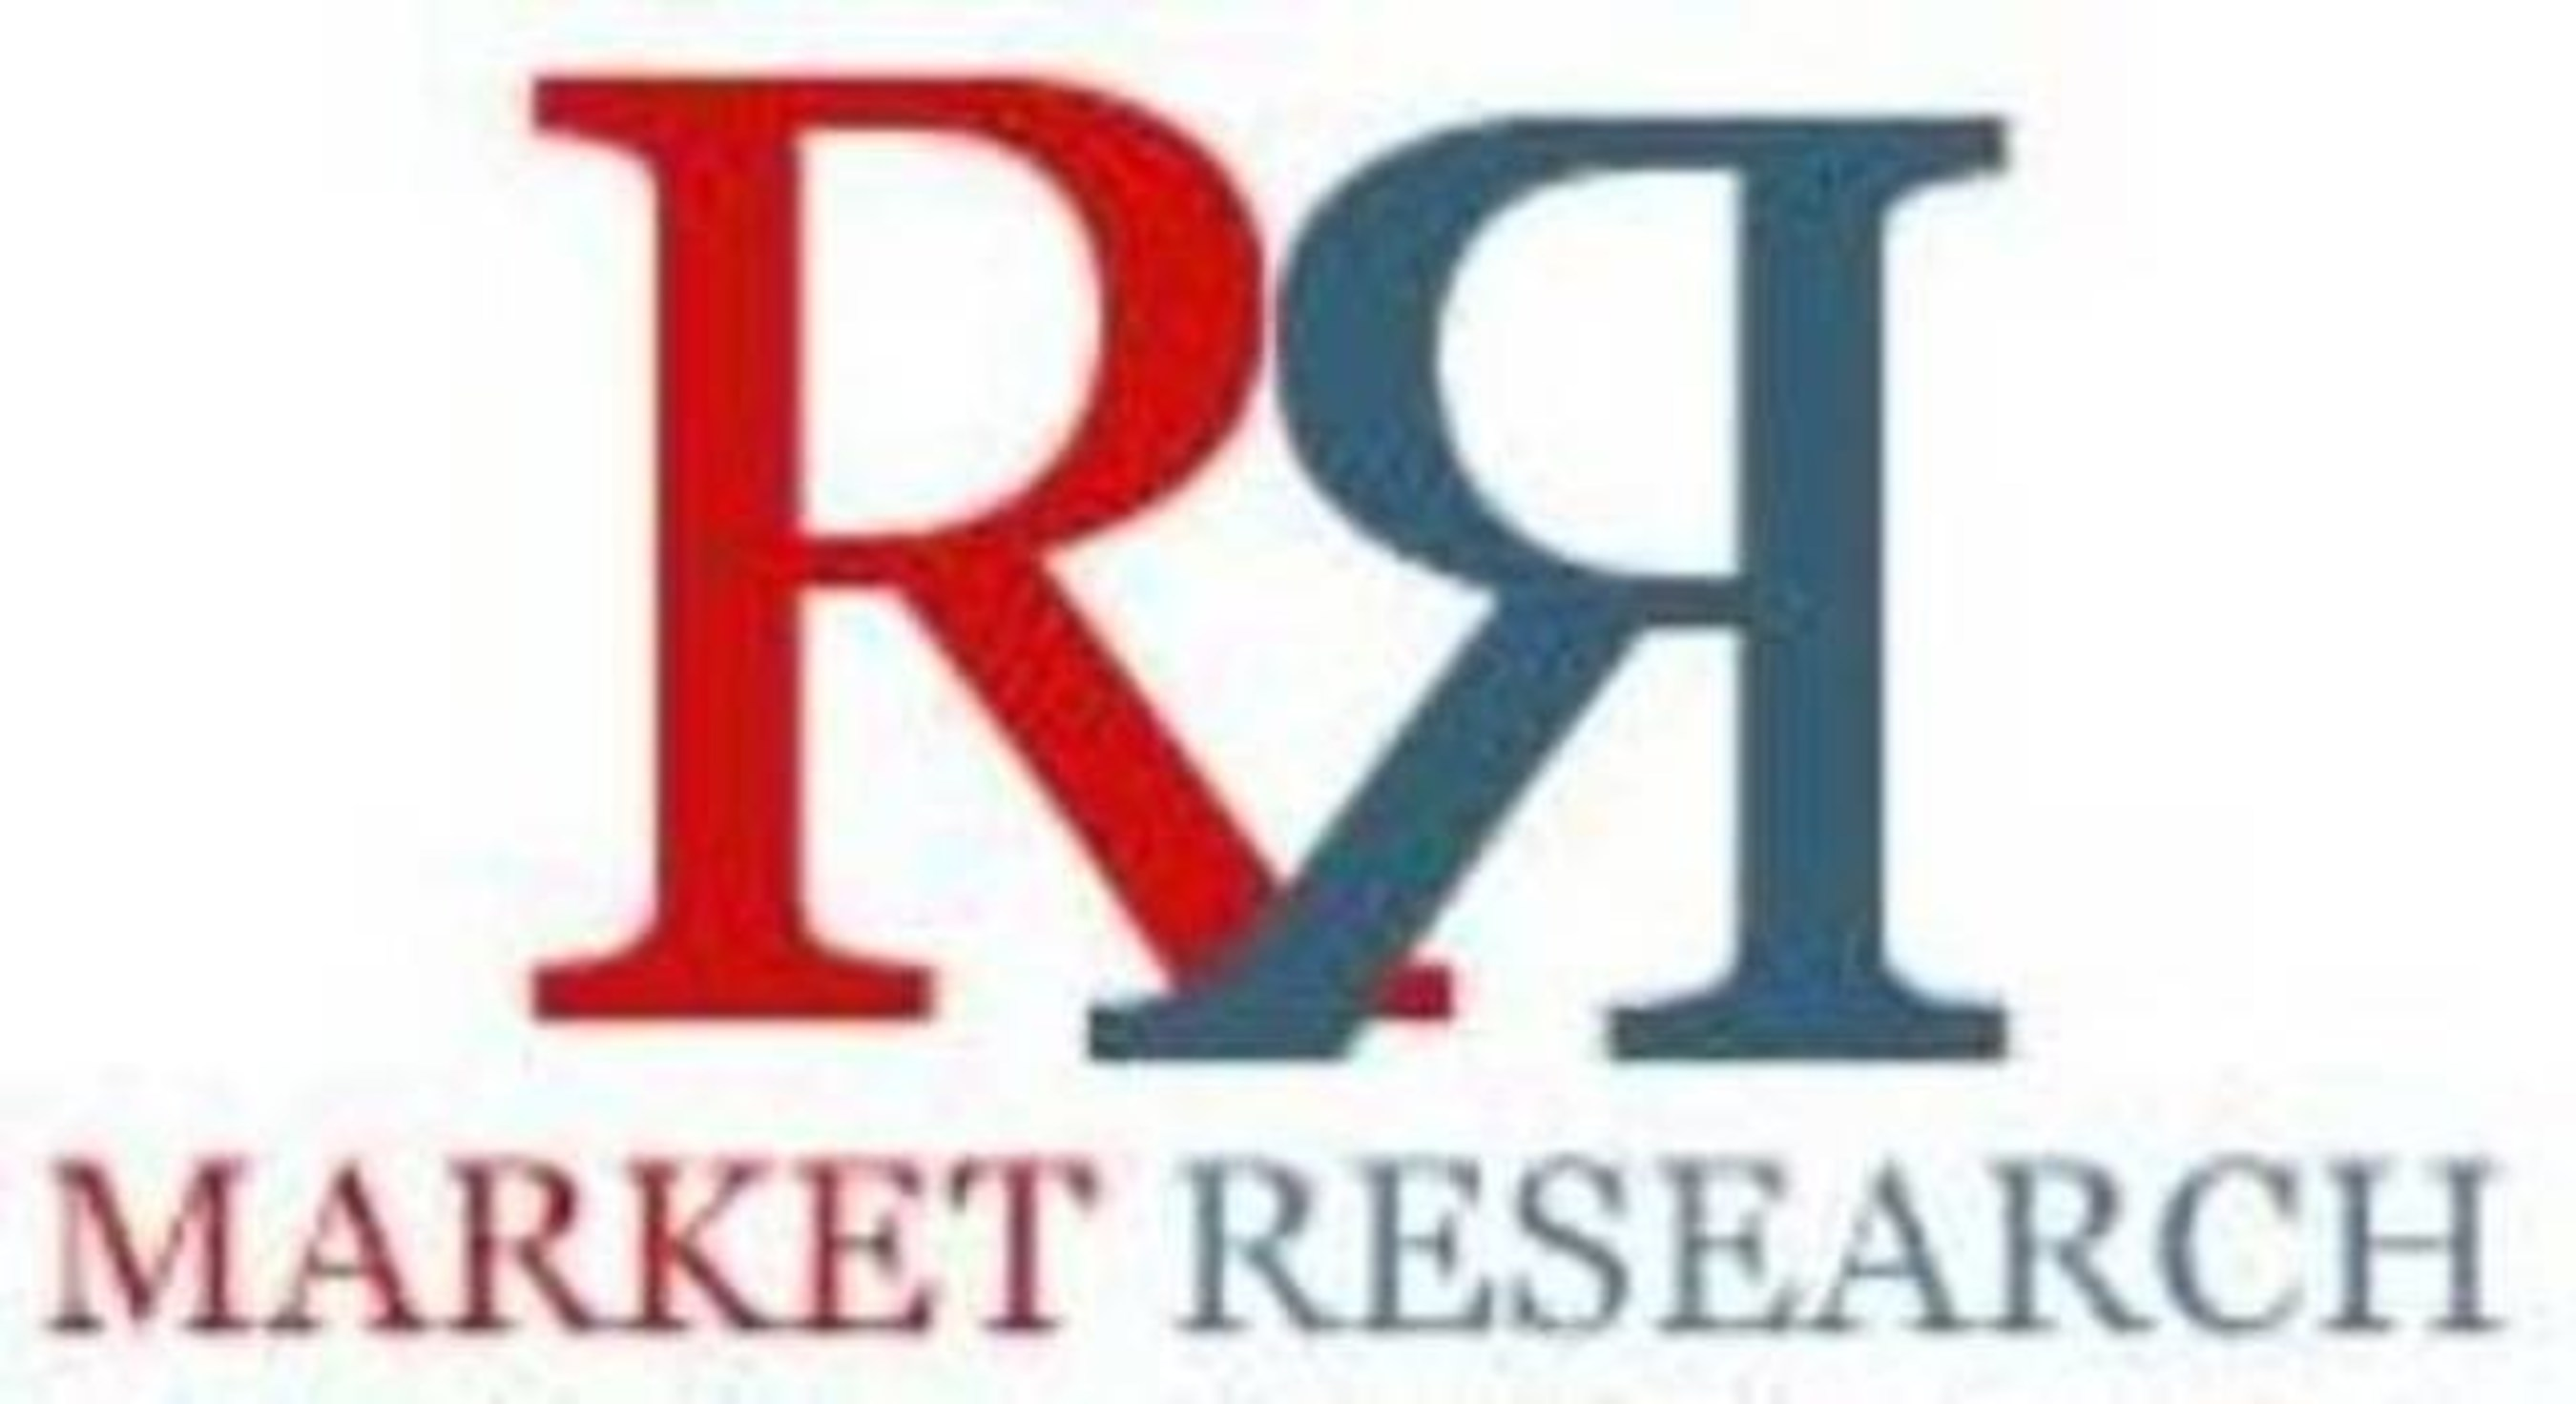 M2M & IoT Technologies Market Global Spending to Reach $250 Billion by 2020